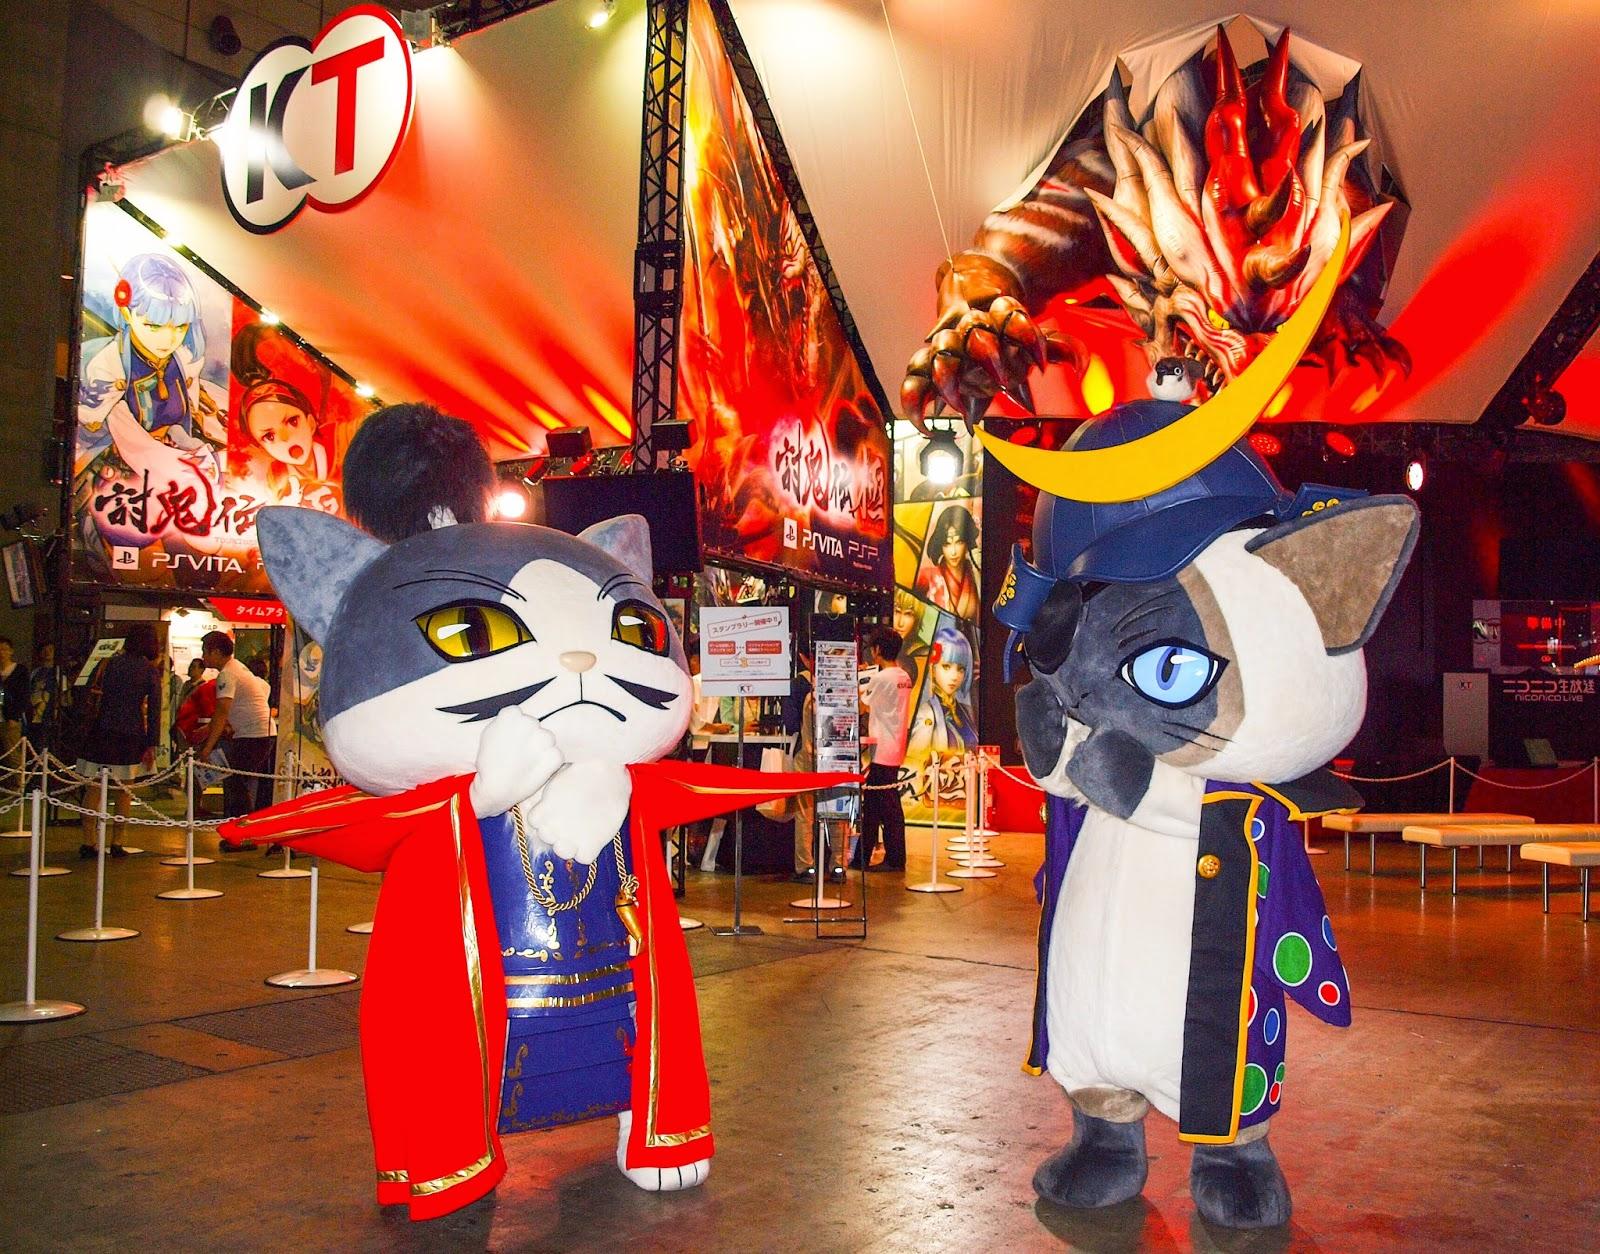 Nobunyaga cosplay